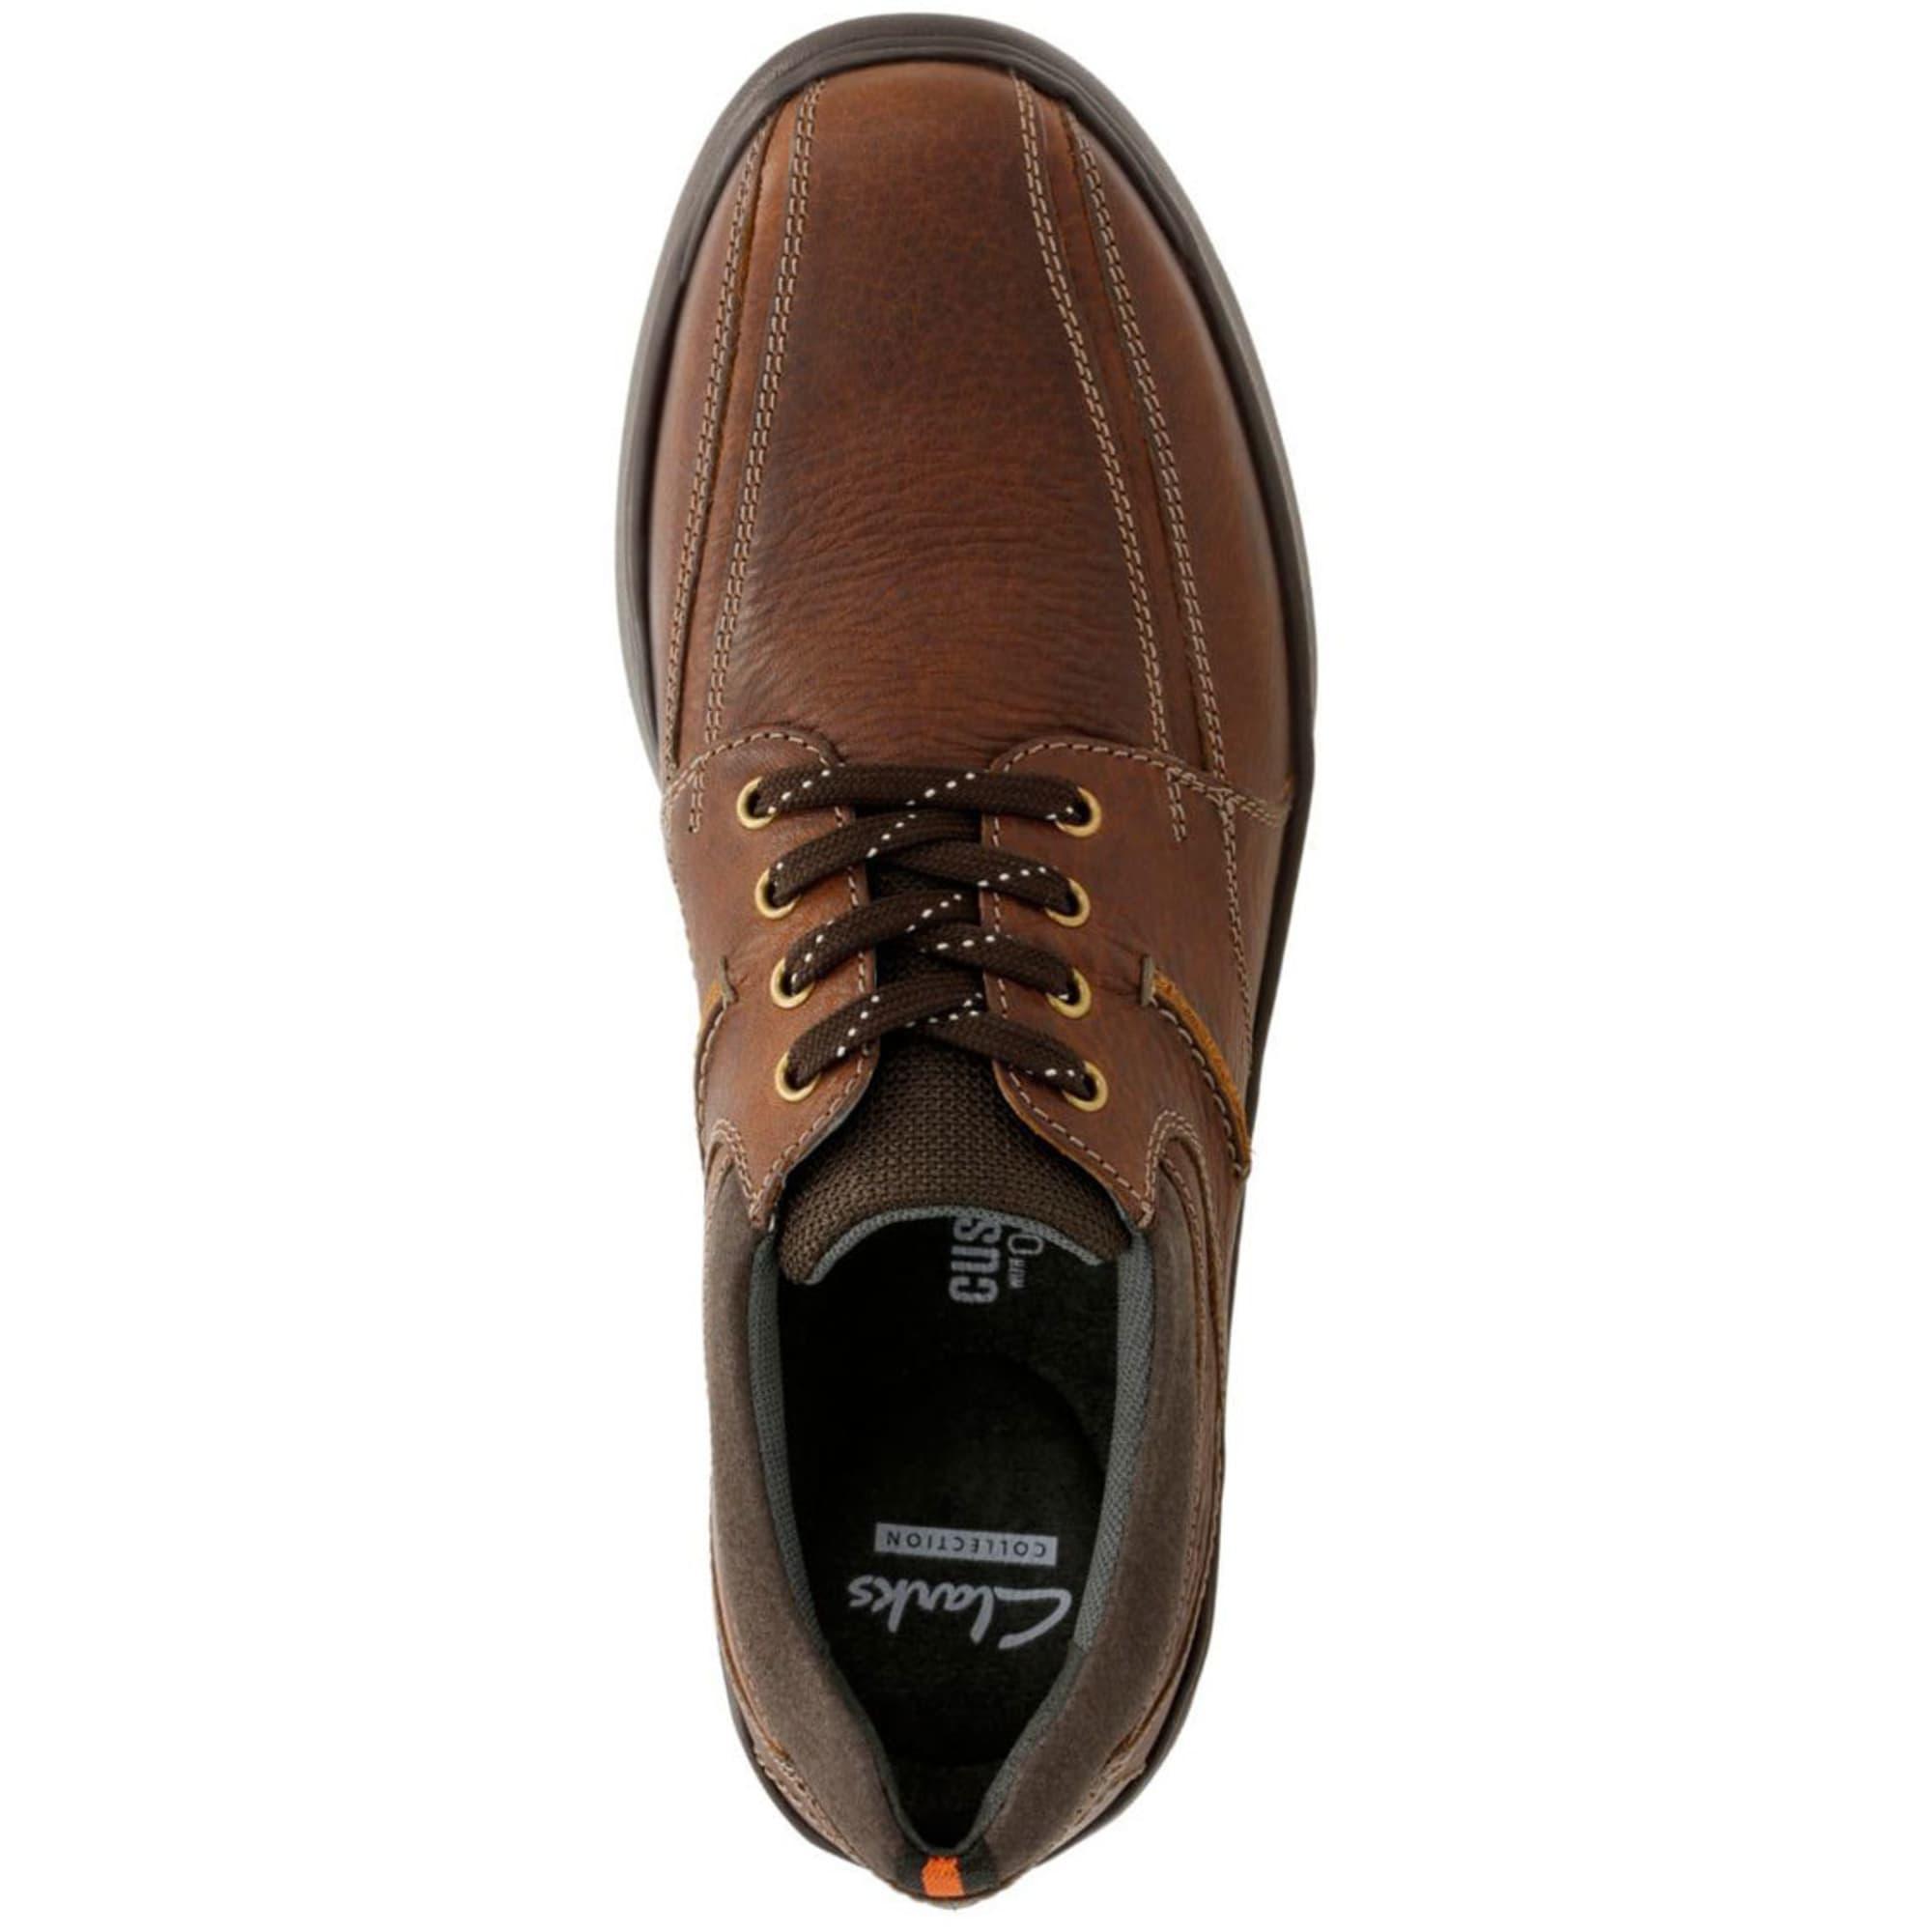 CLARKS Men's Cotrell Walk Oxford Shoes